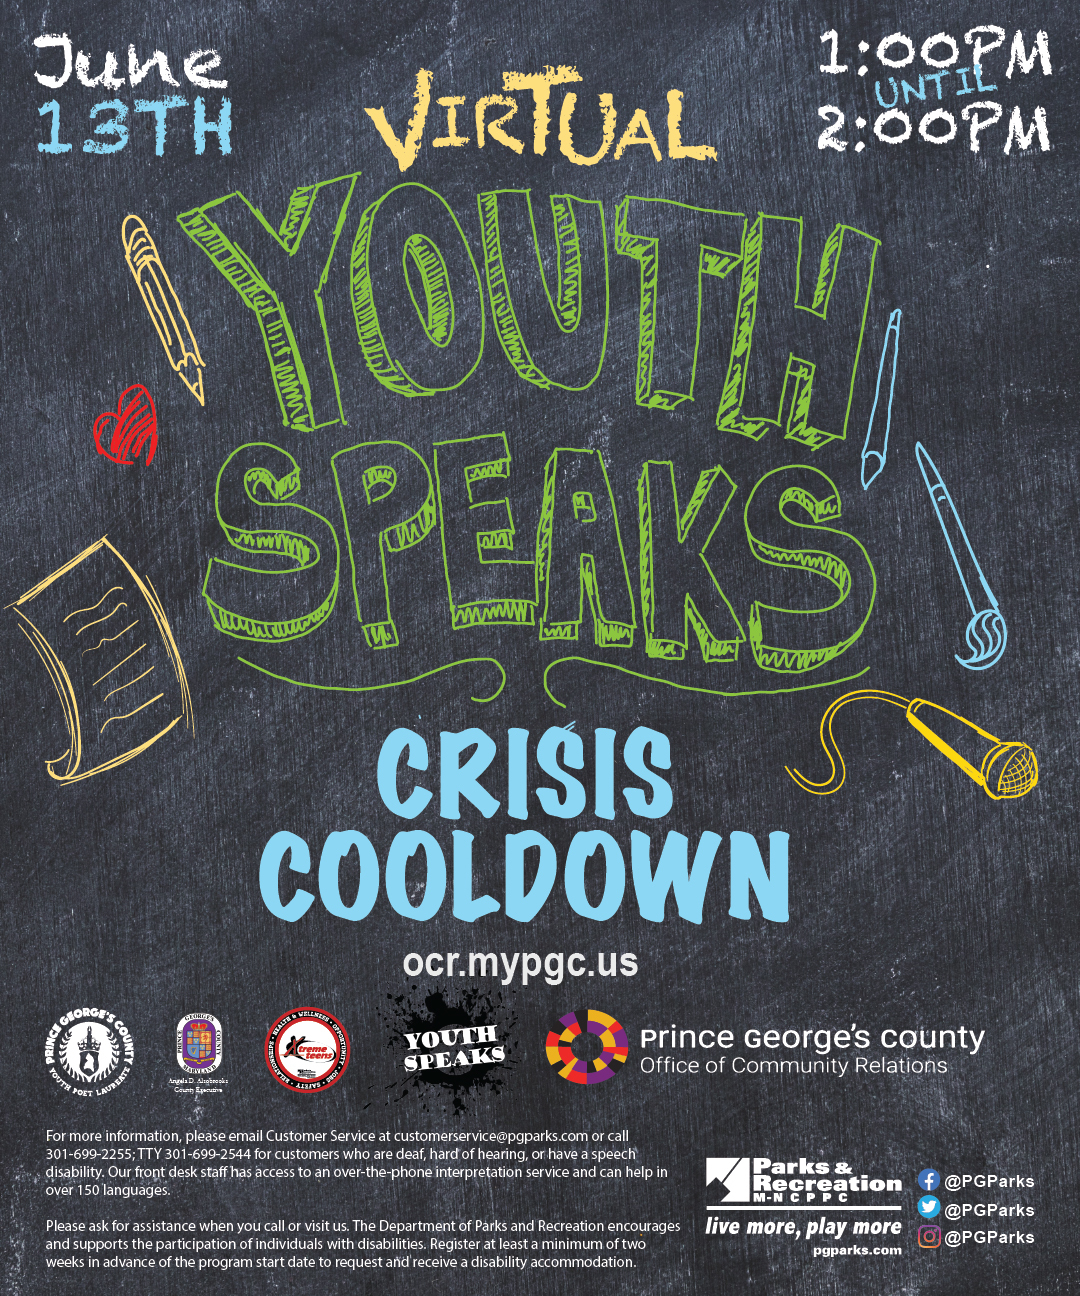 Youth Speaks June 13